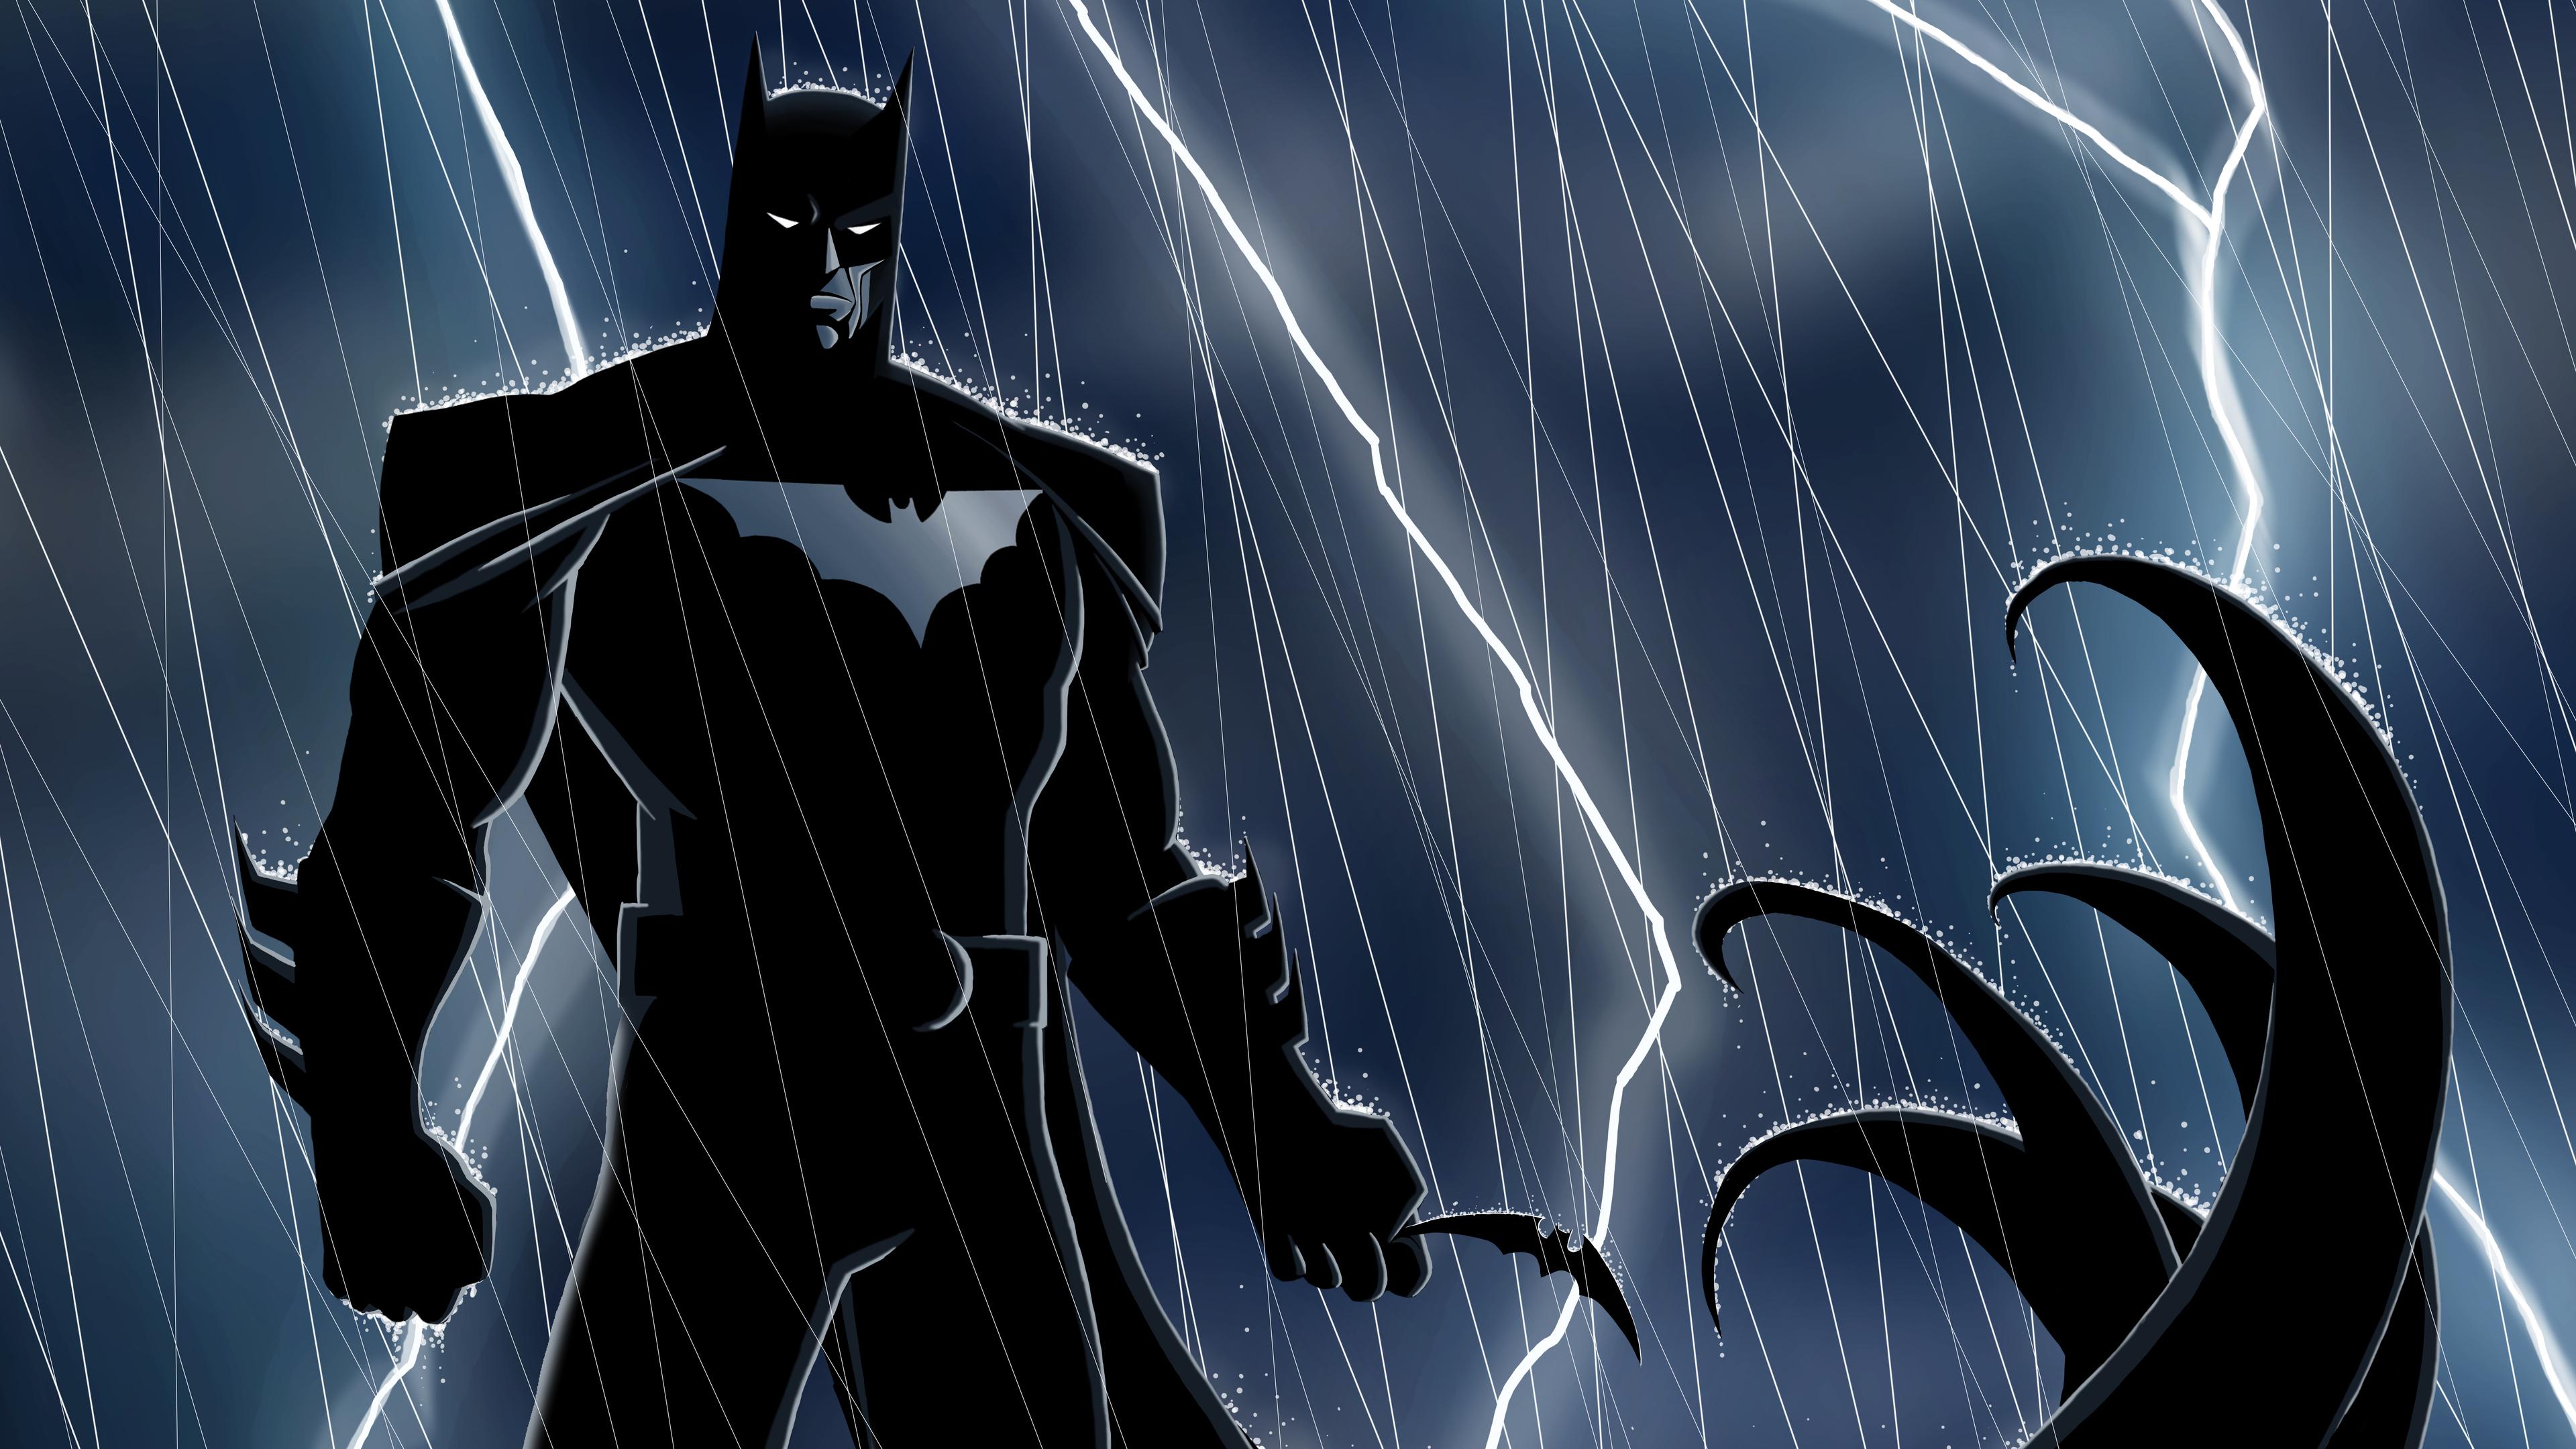 batman 4k 1546276354 - Batman 4k - superheroes wallpapers, hd-wallpapers, digital art wallpapers, deviantart wallpapers, batman wallpapers, artwork wallpapers, 8k wallpapers, 5k wallpapers, 4k-wallpapers